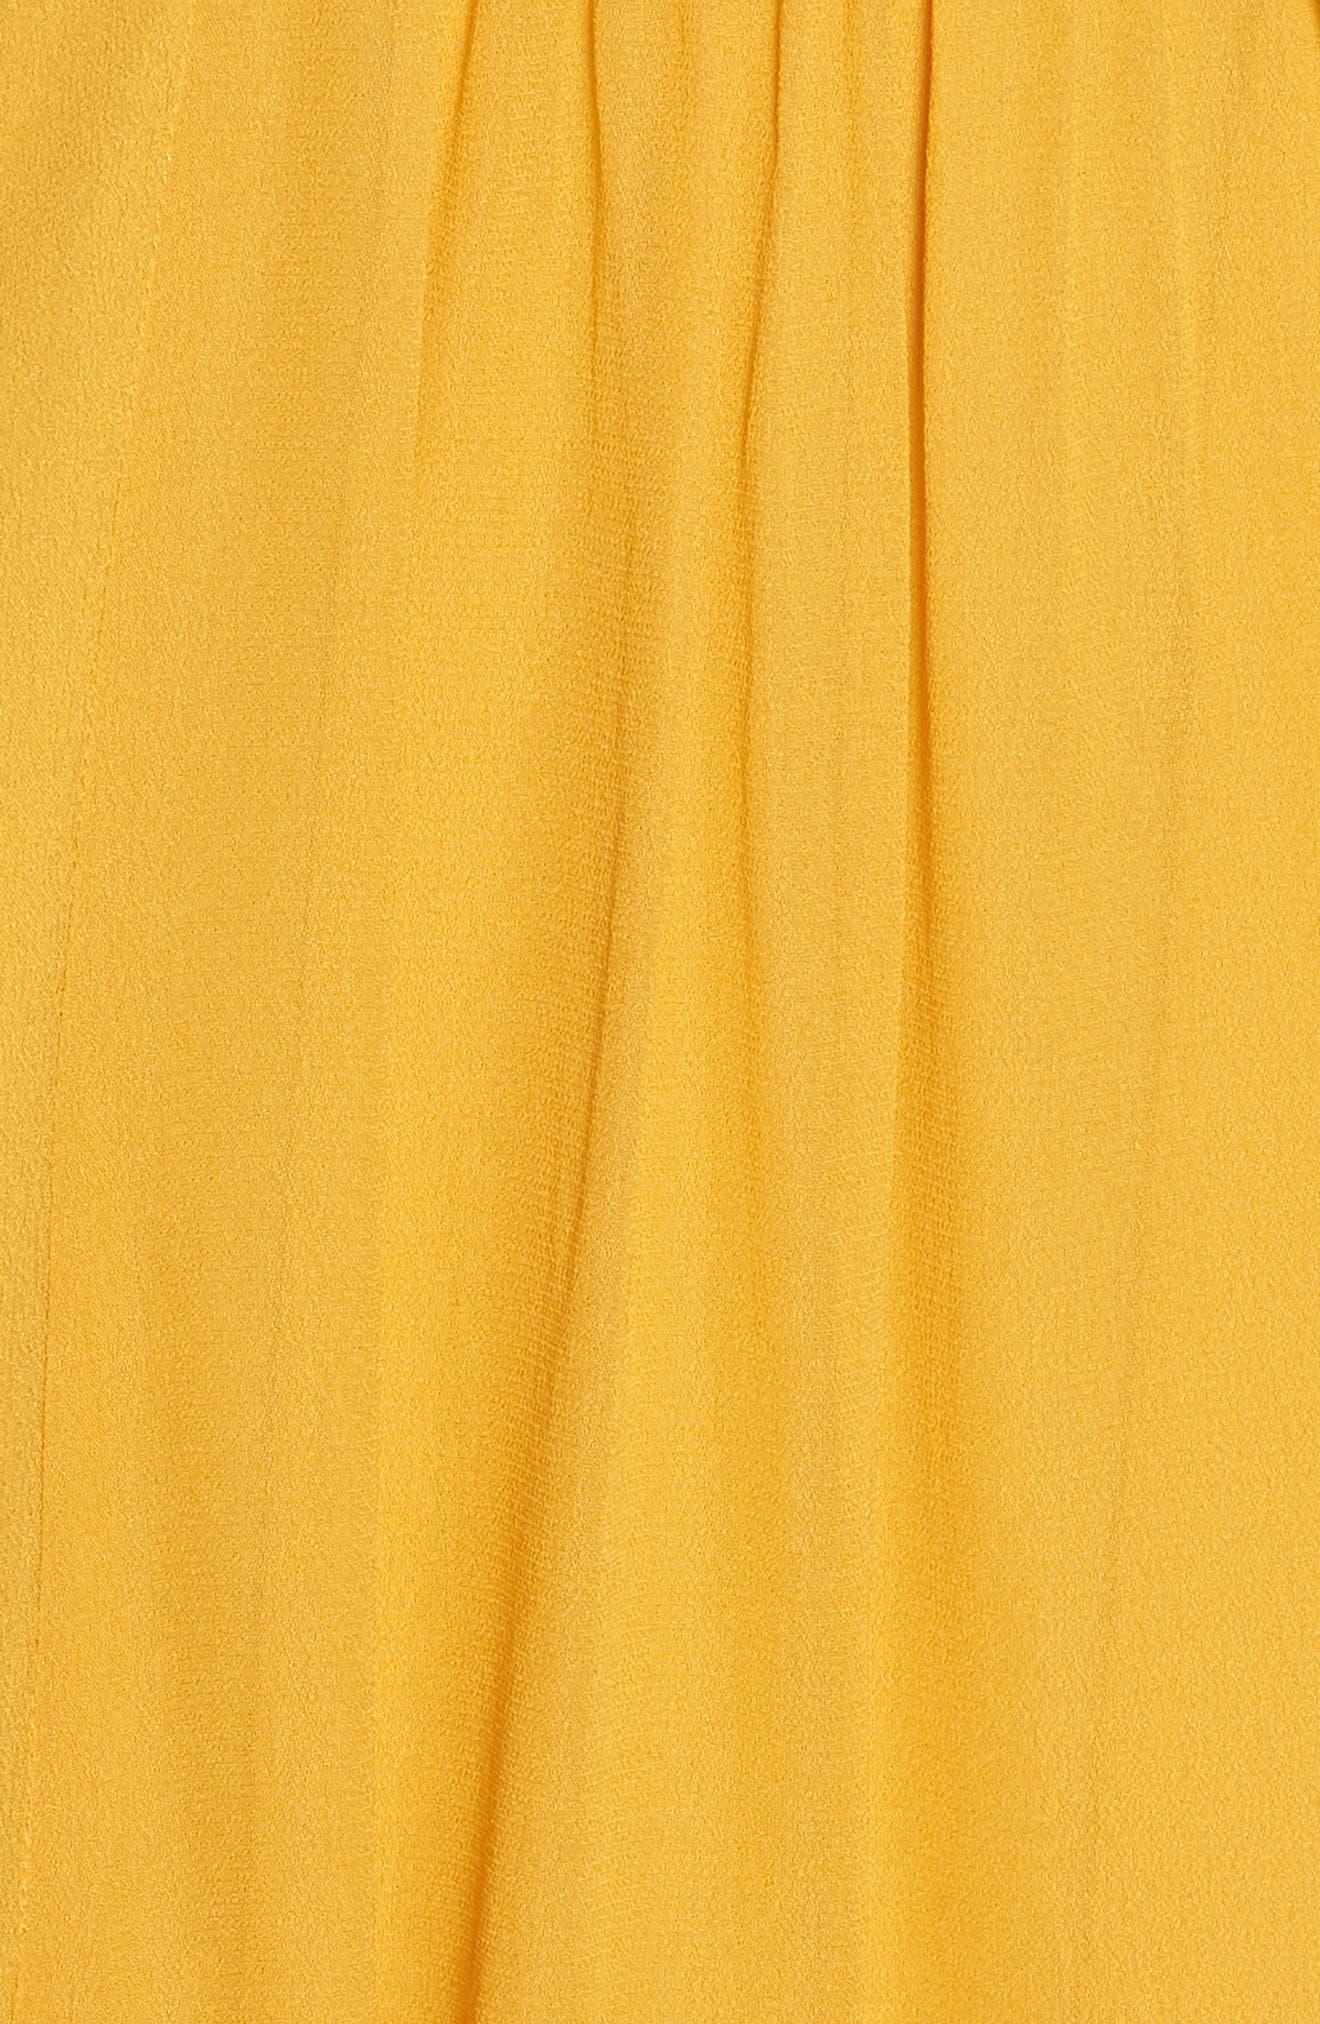 Embroidered Yoke Trapeze Dress,                             Alternate thumbnail 6, color,